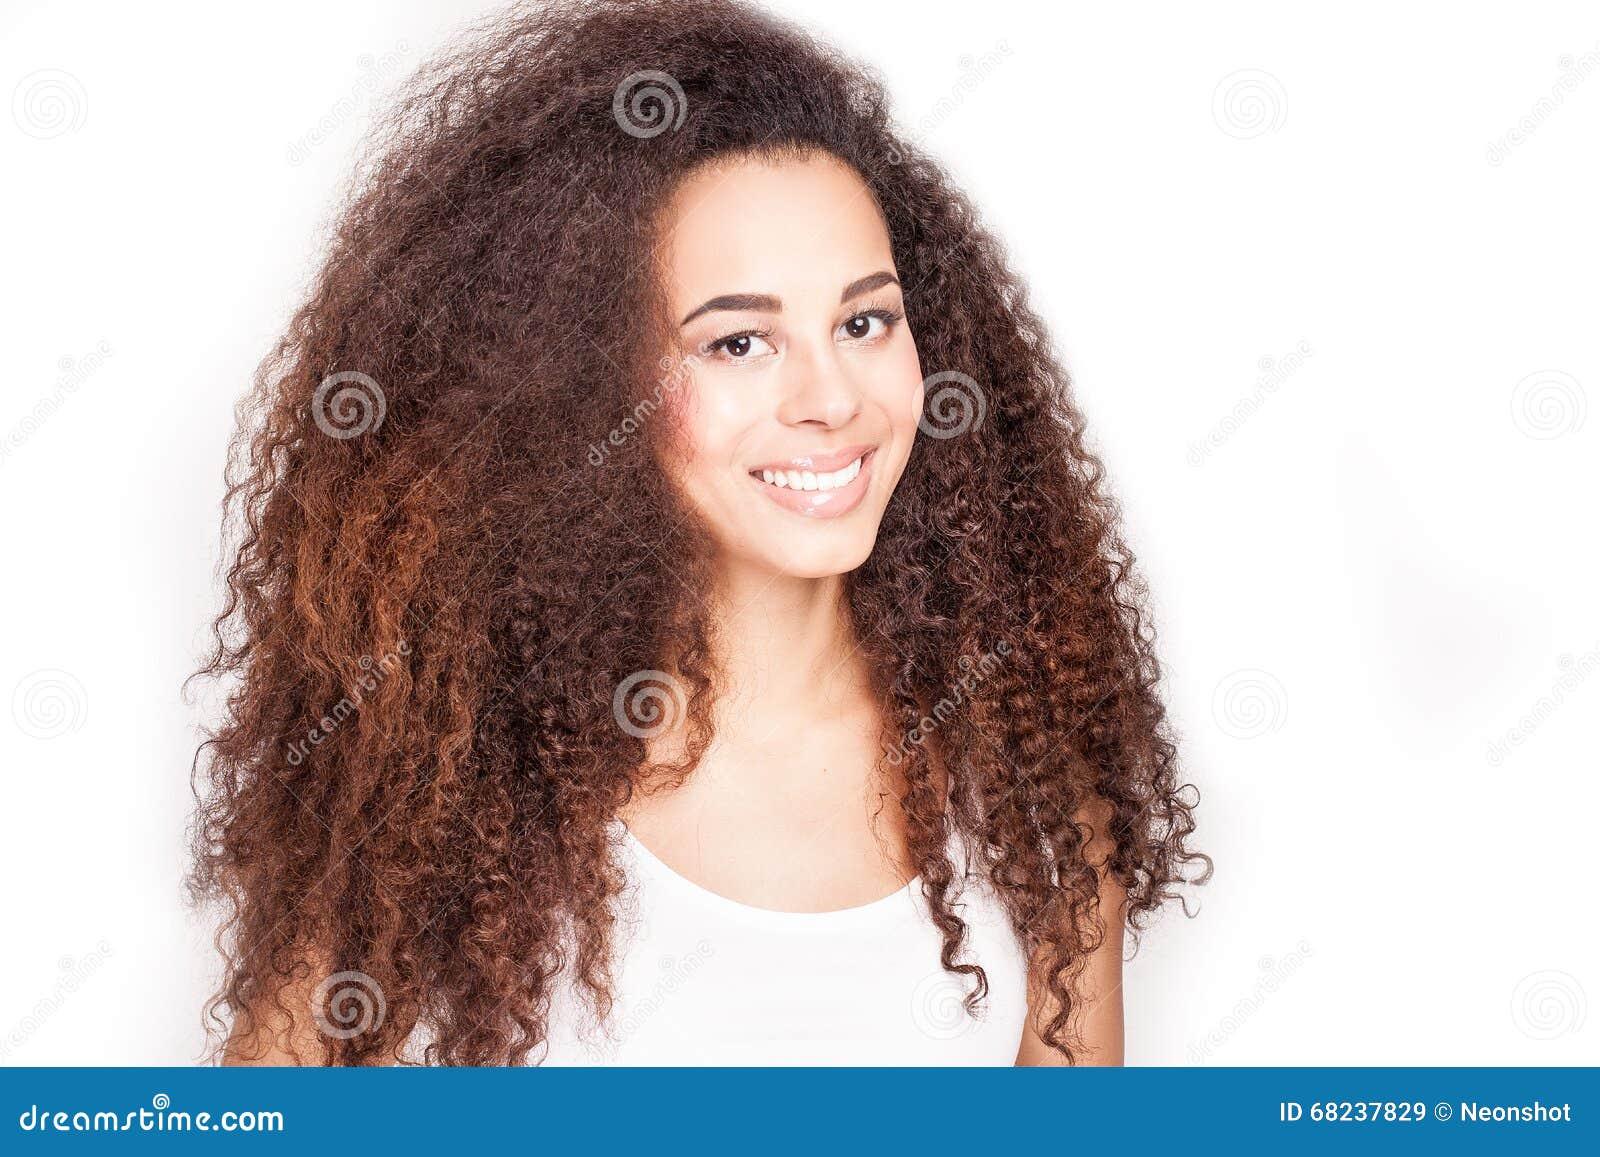 Beauty portrait of african american girl.